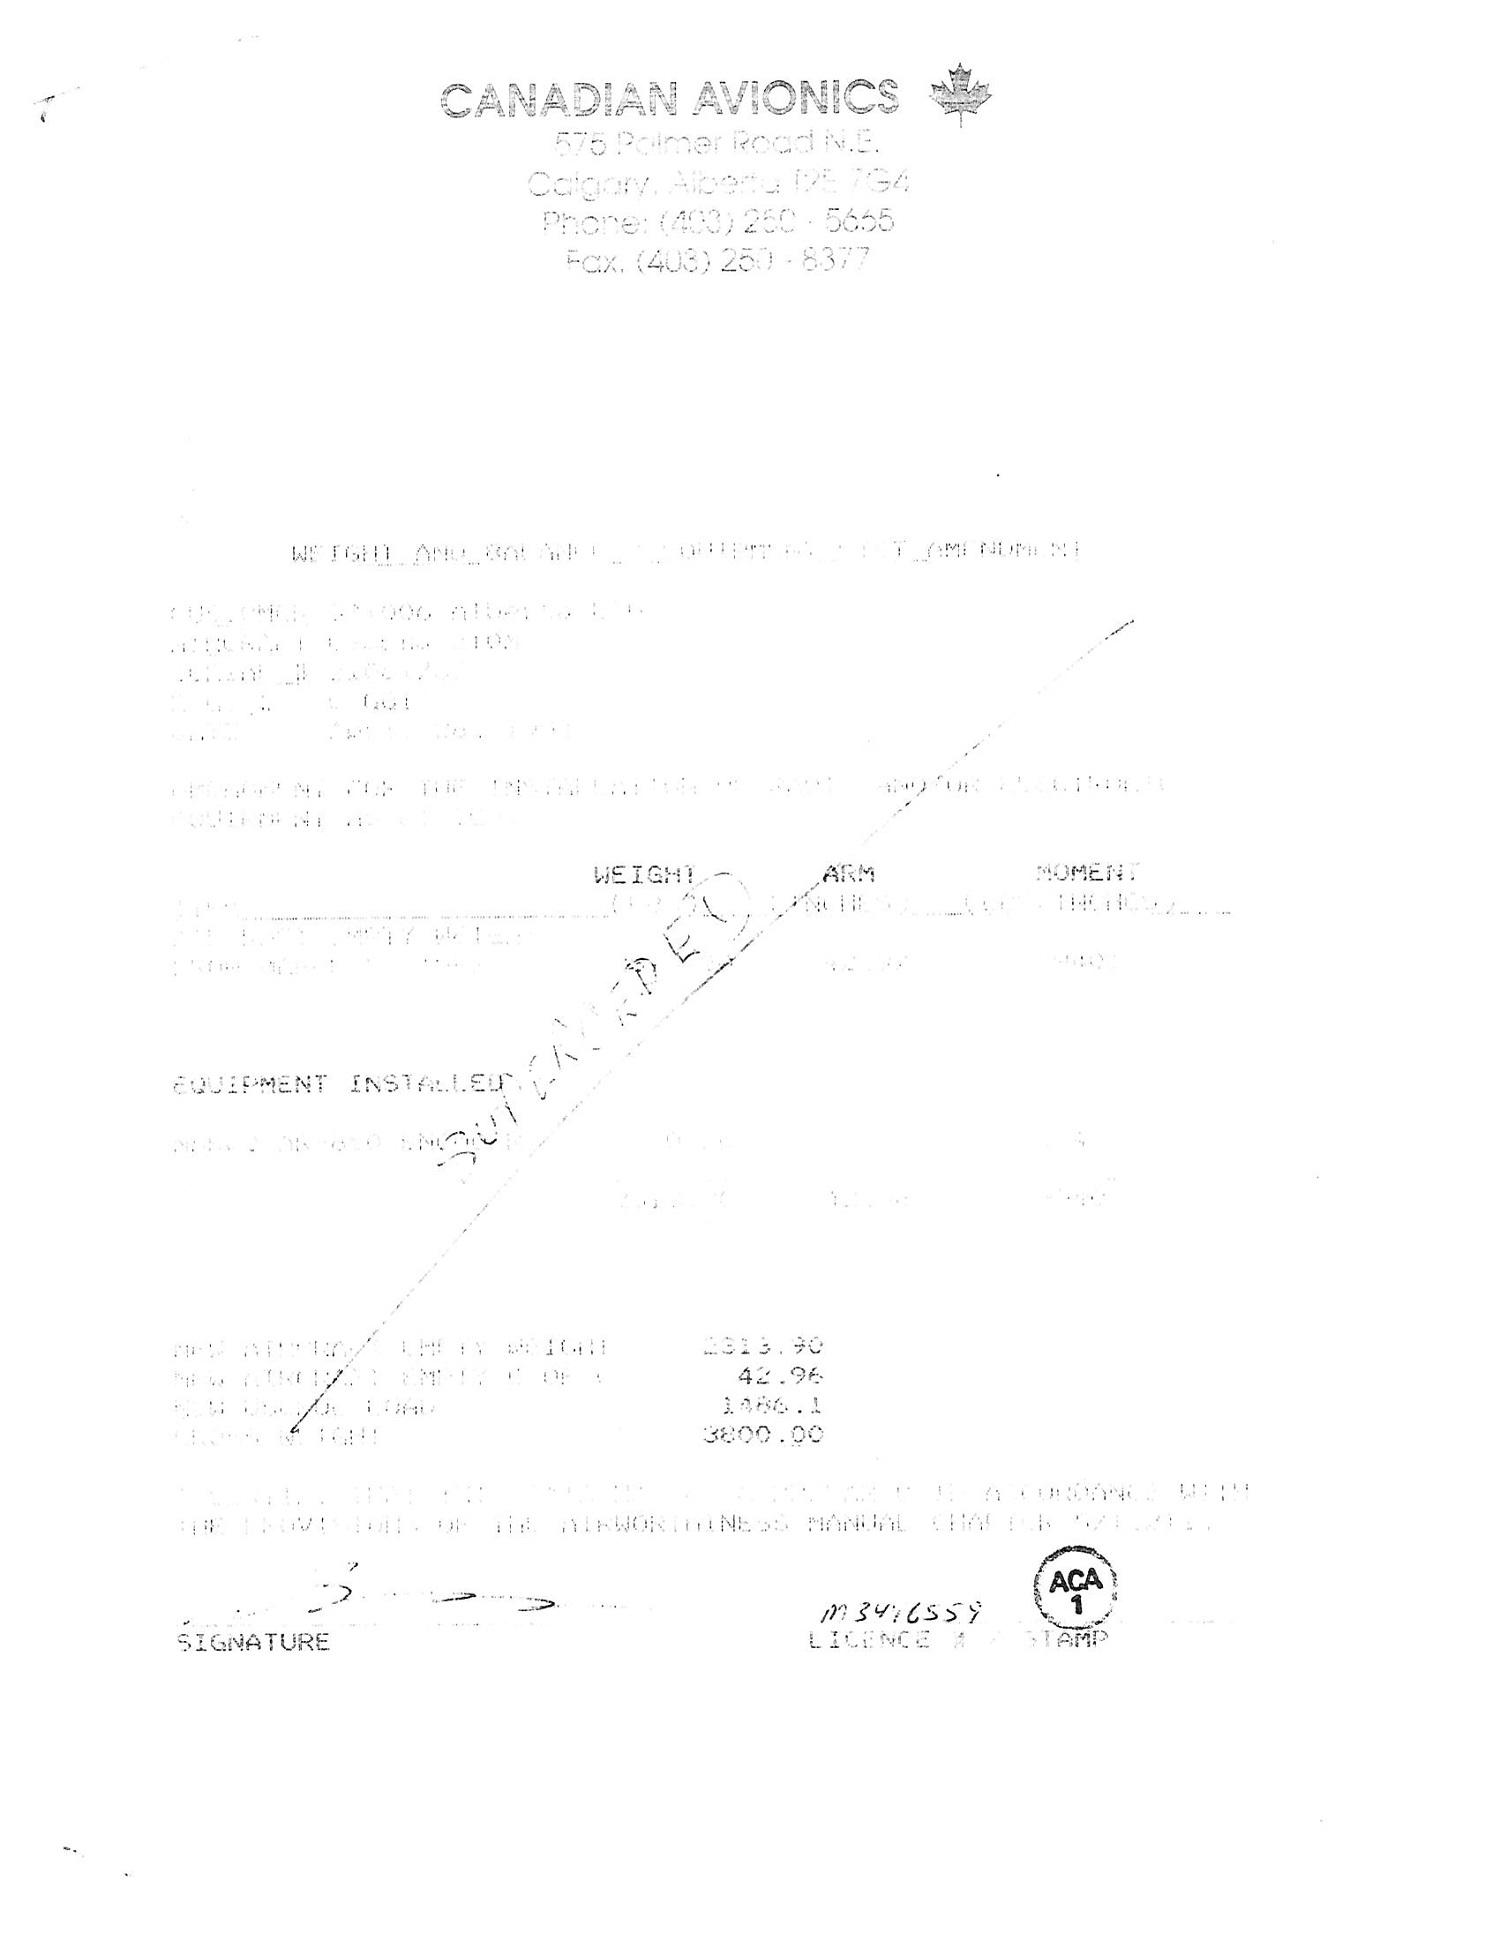 Image (3) (1).jpg